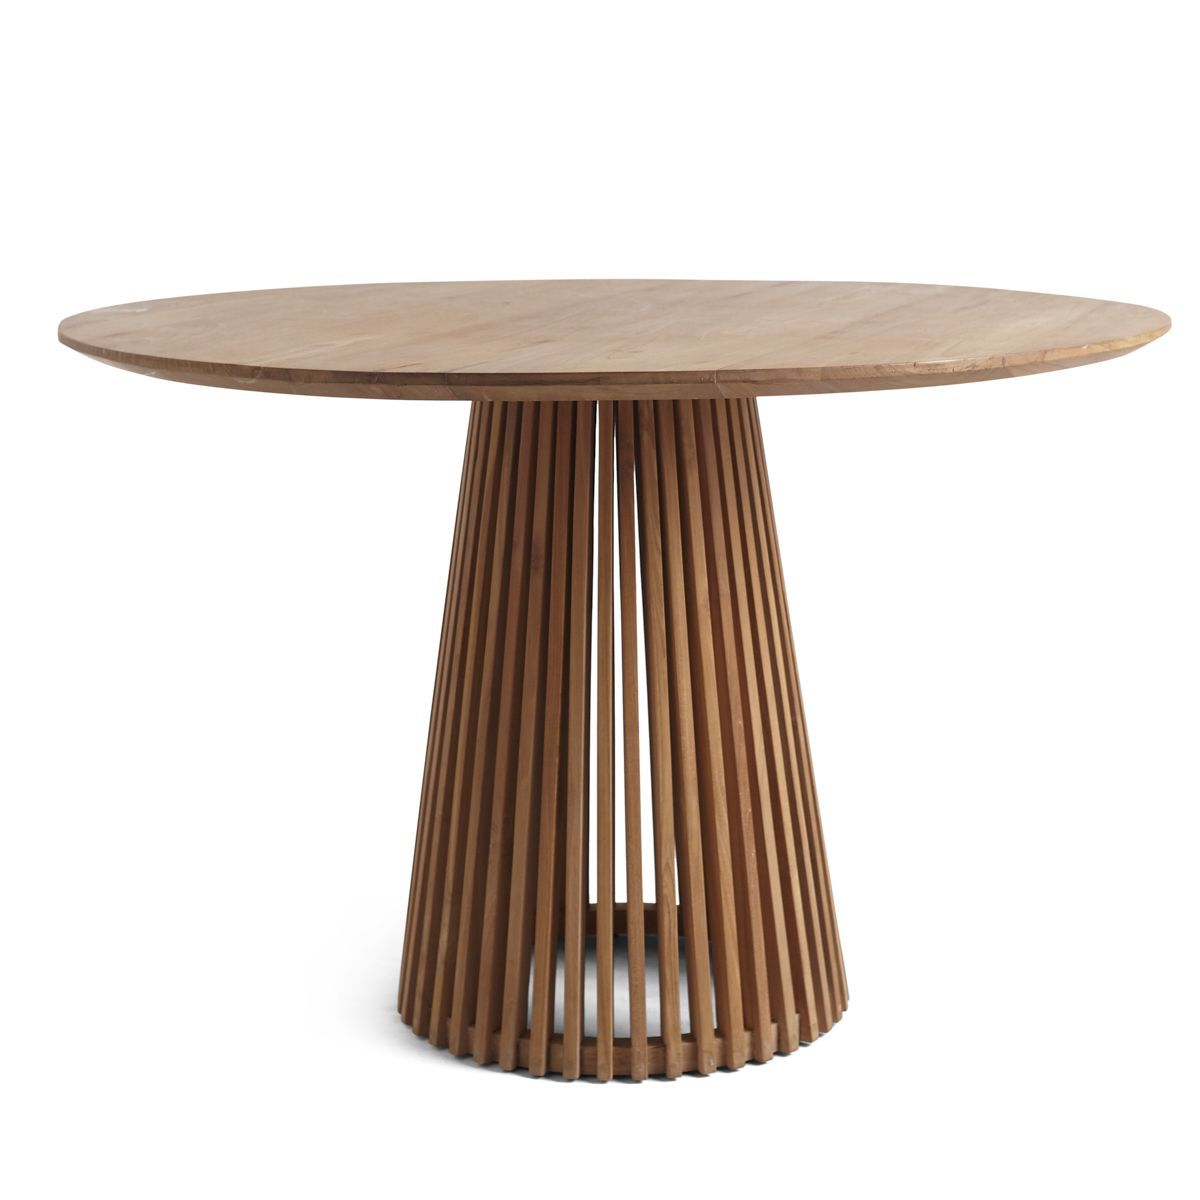 Slatted Teak Circular Dining Table Circular Dining Table Teak Dining Table Dining Table